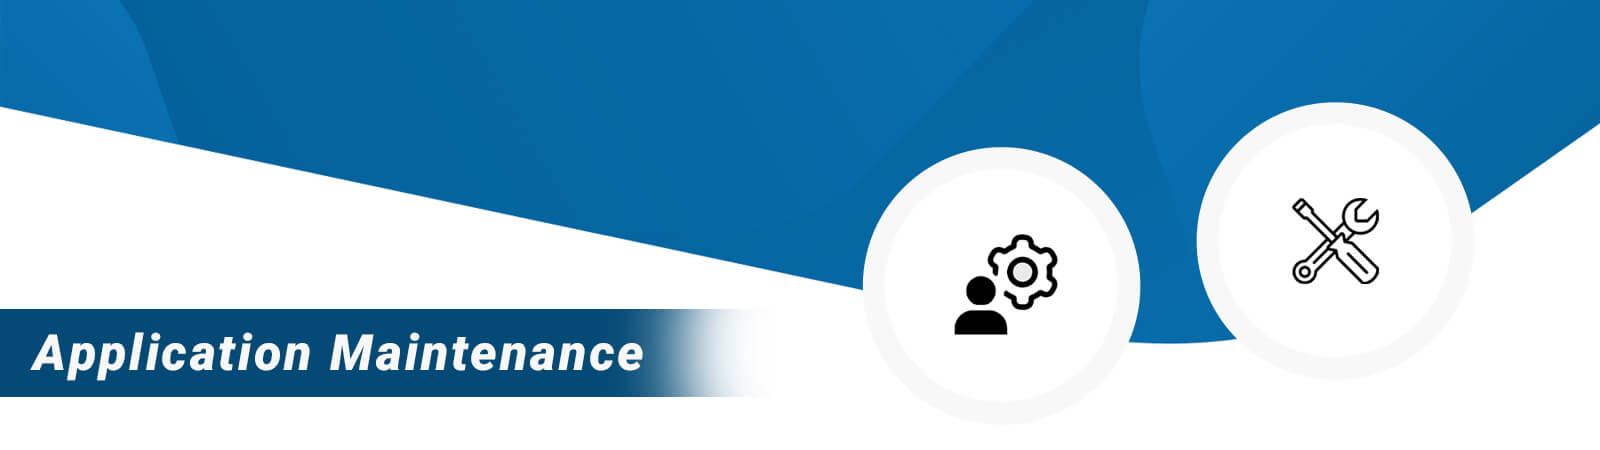 application-maintenance-support